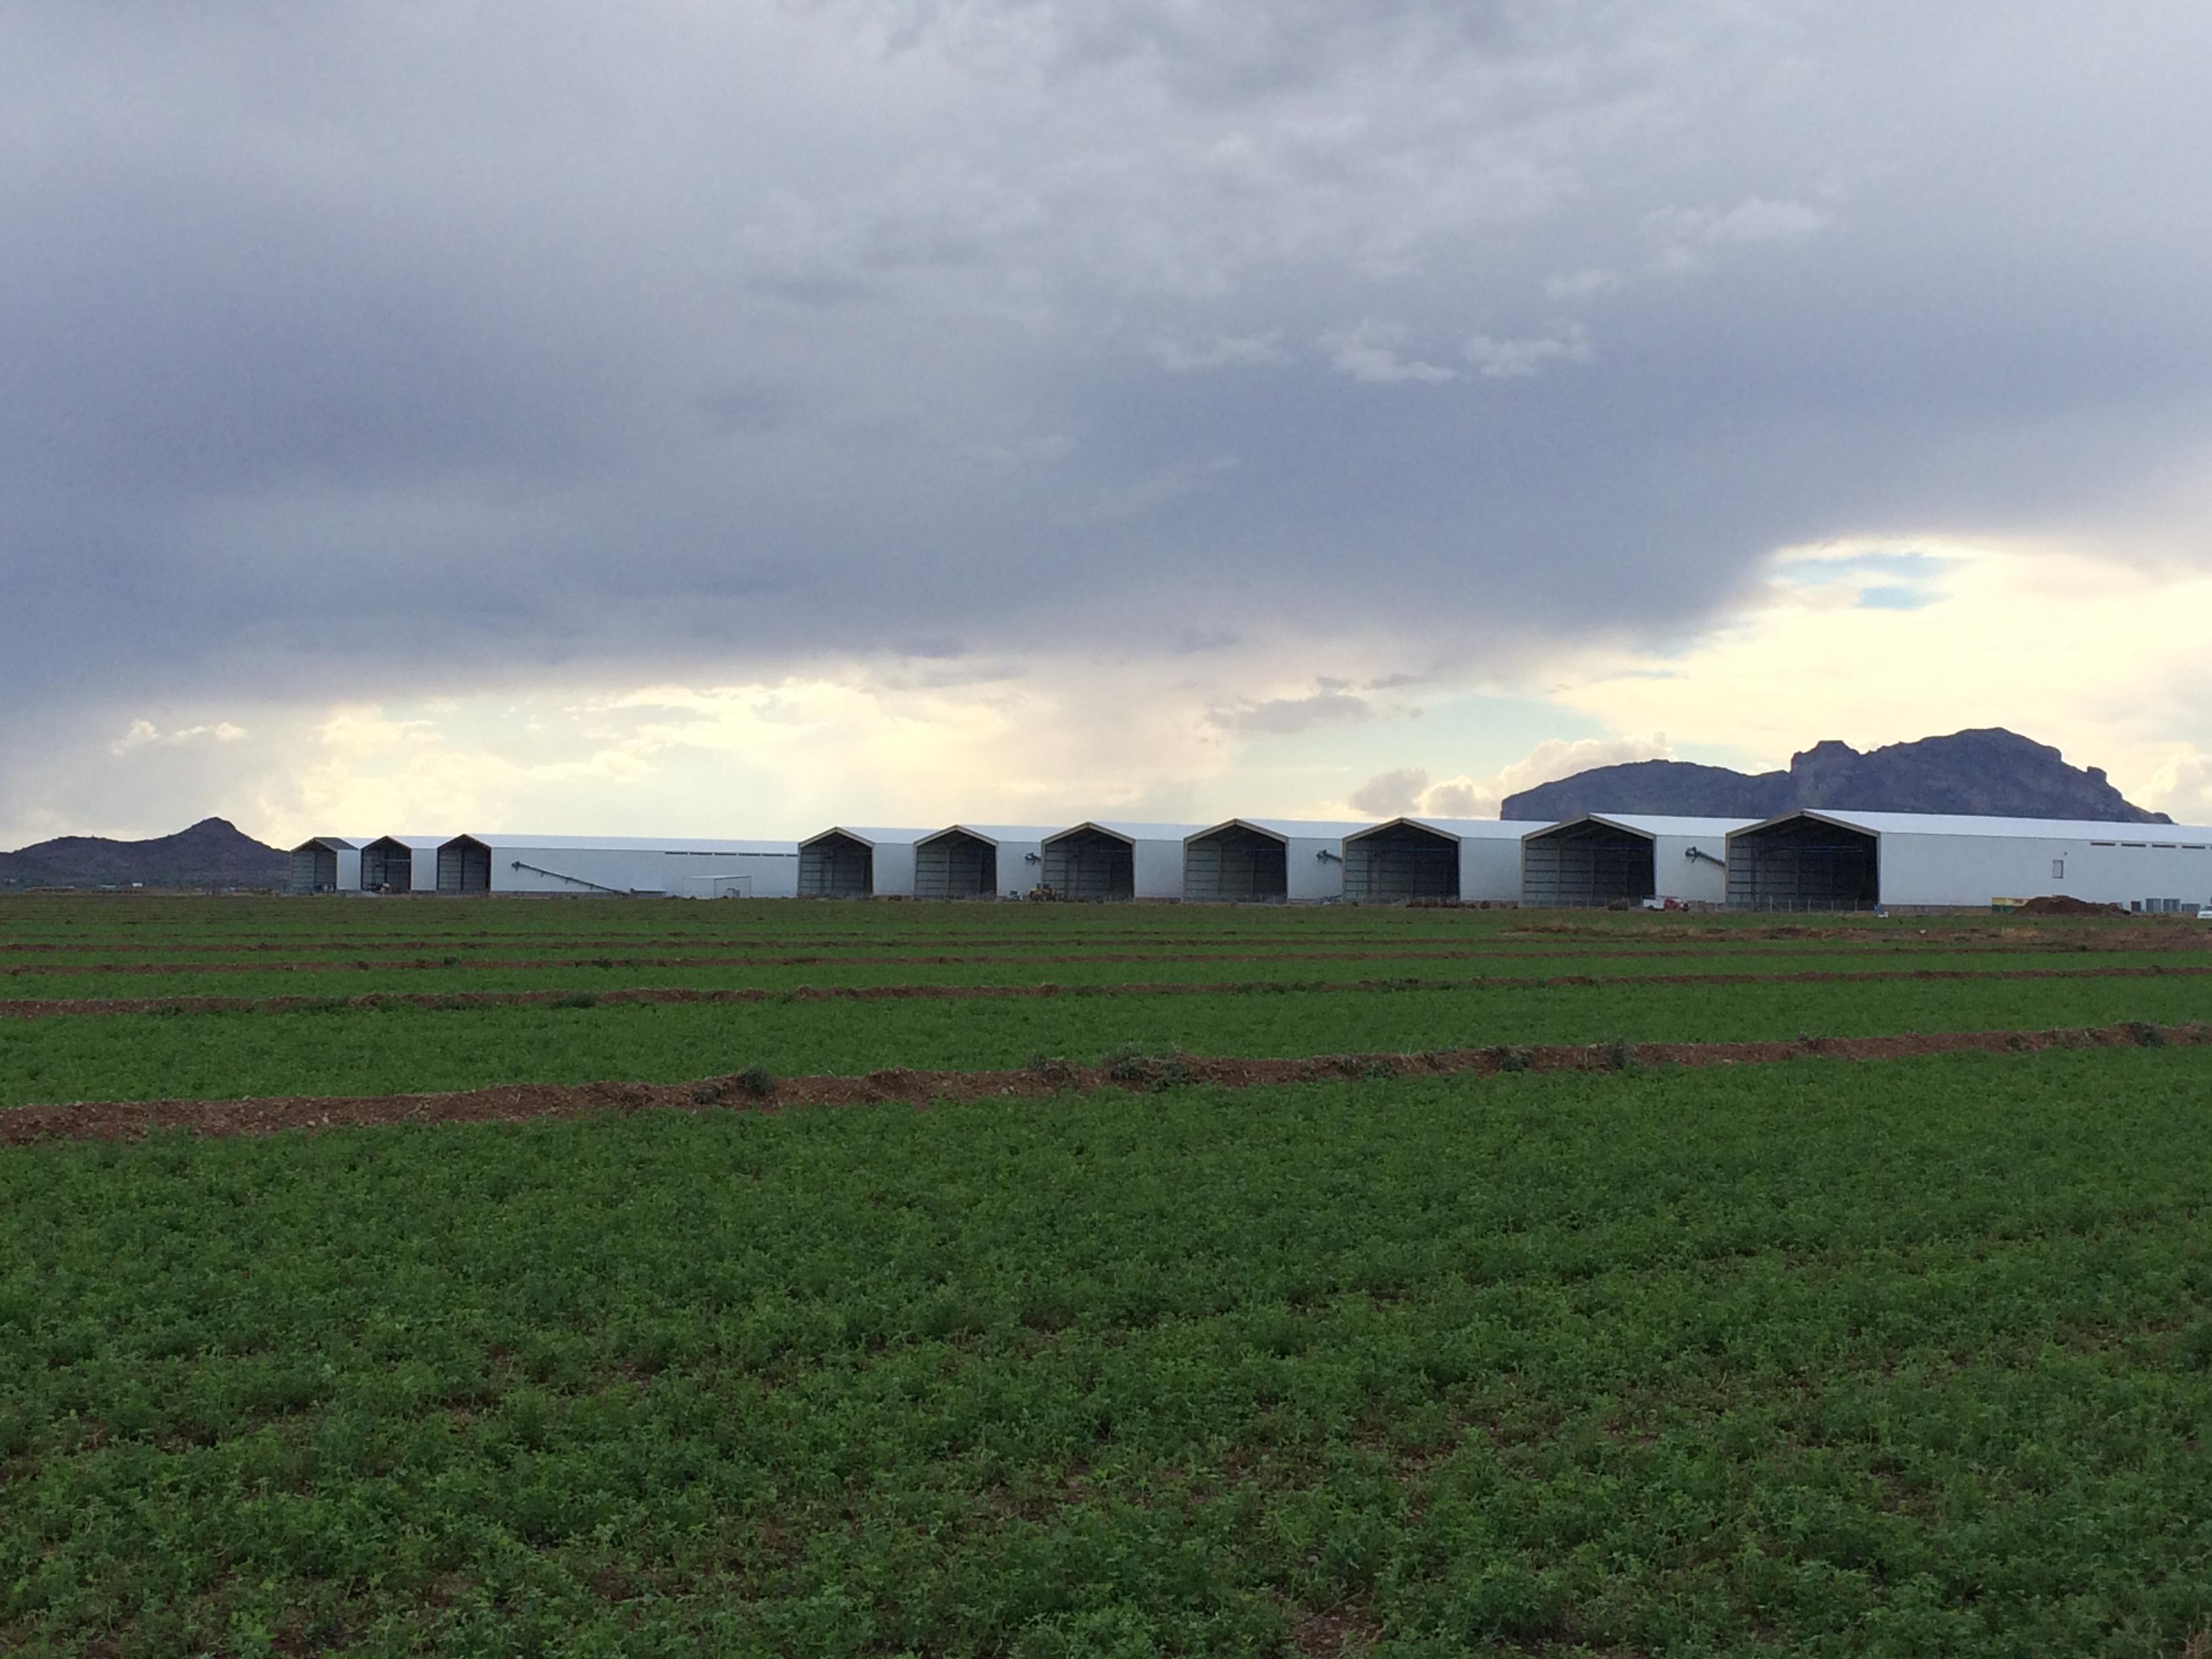 Hickmans Family Farms